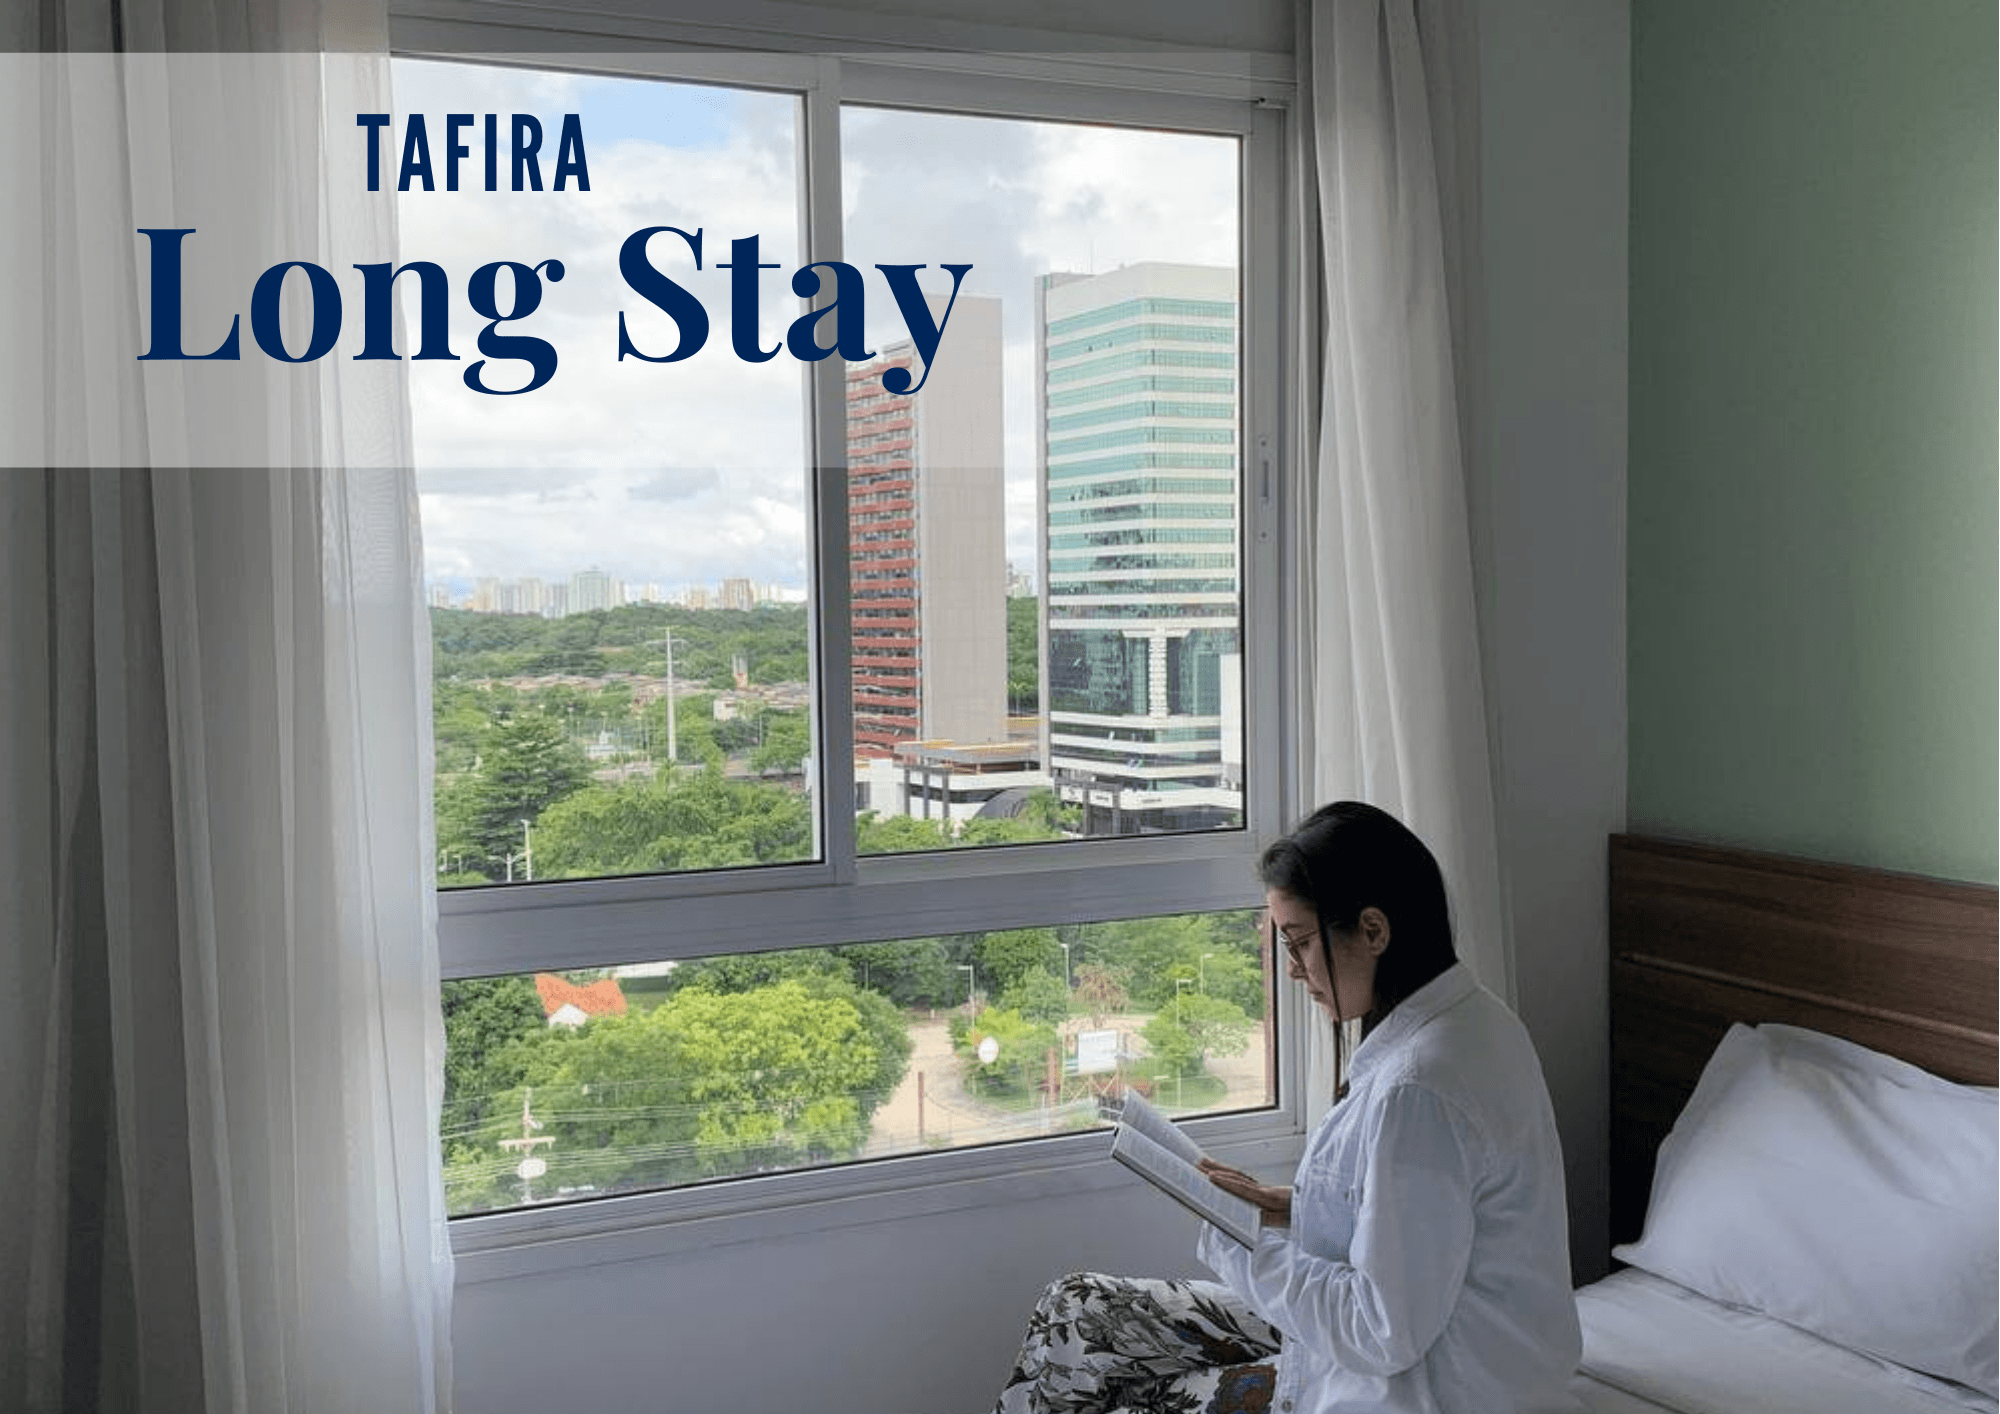 TARIFA LONG STAY COM LAVAGEM DE ROUPA INCLUSA